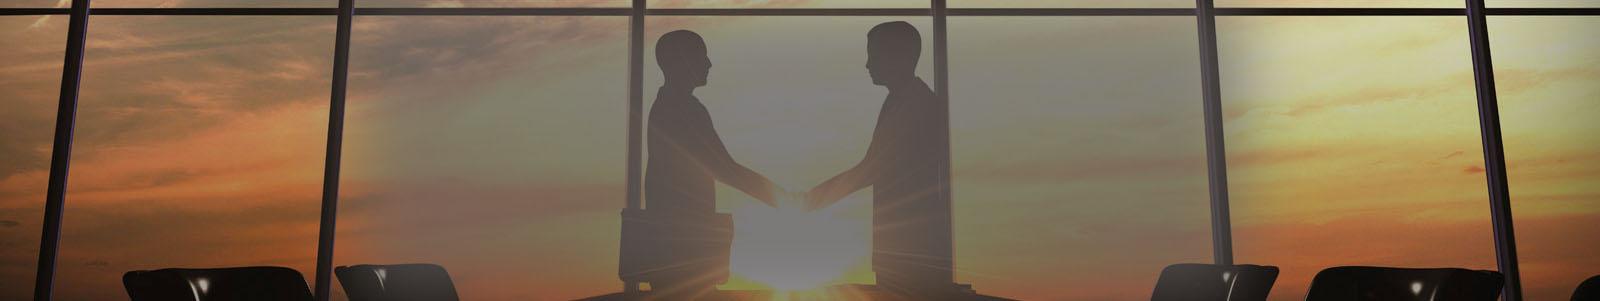 Employment-Screening-Slide-Handshake